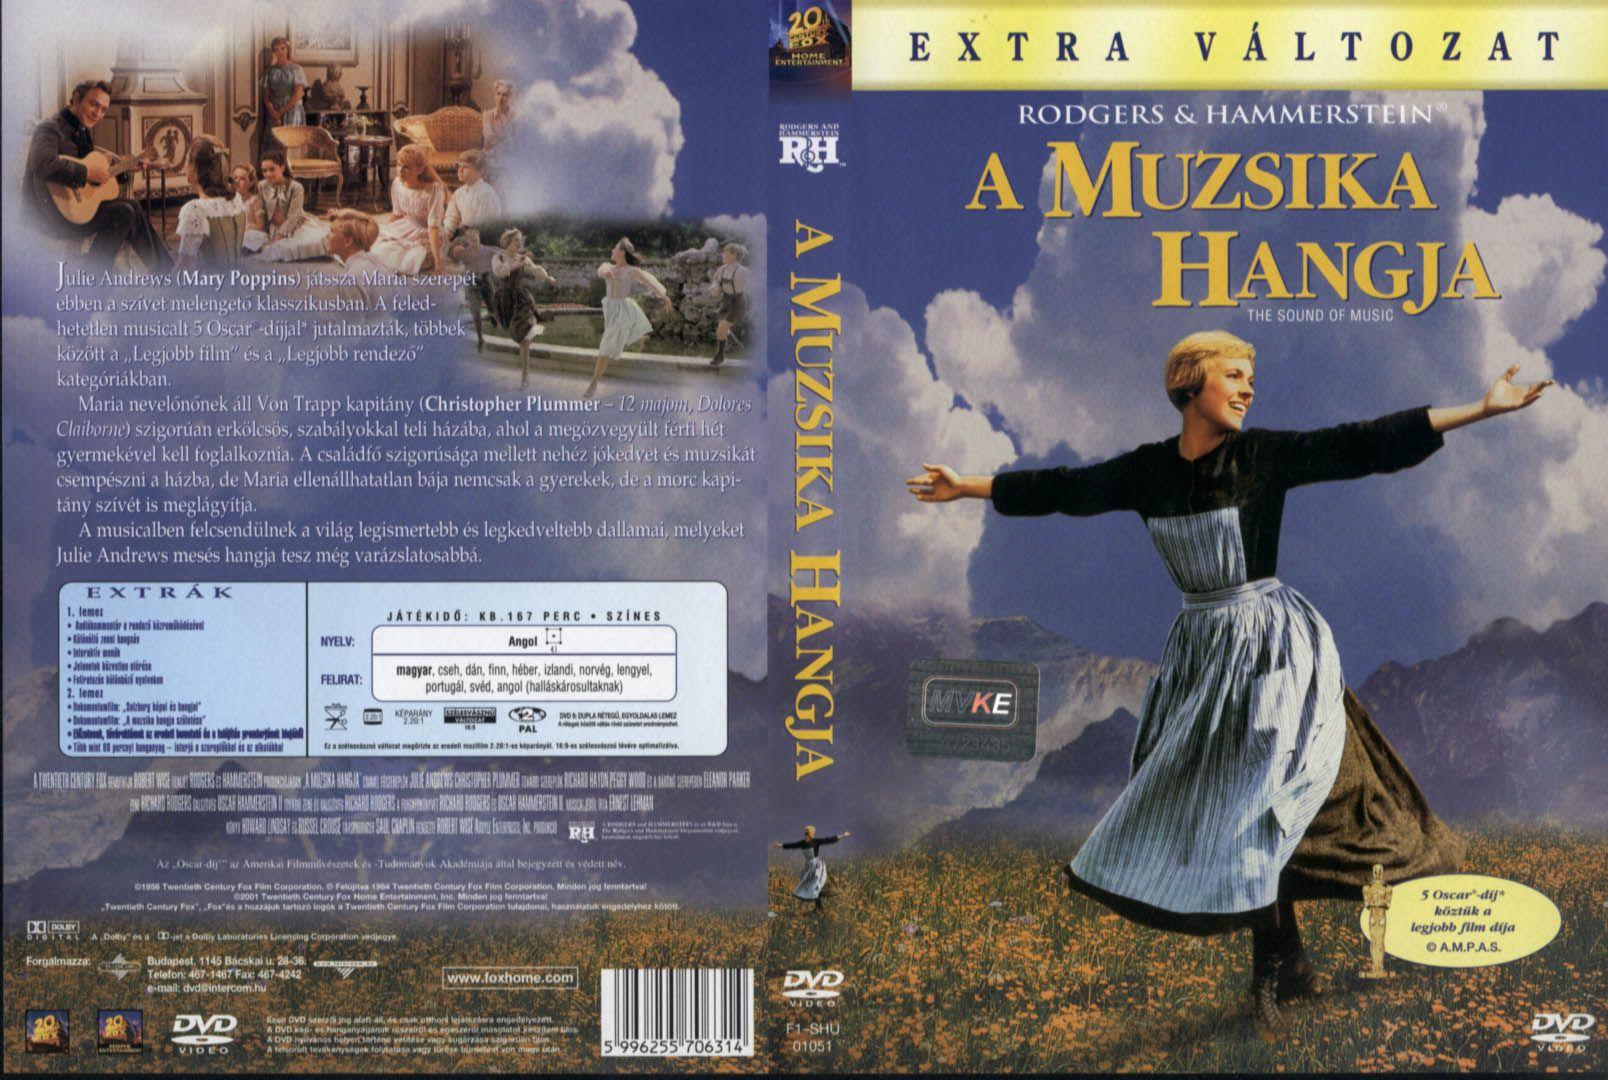 A Muzsika Hangja Szines Magyarul Beszelo Amerikai Eletrajzi Drama 174 Perc 1965 Maria Julie Andrews A Fiatal Sound Of Music Music Christopher Plummer